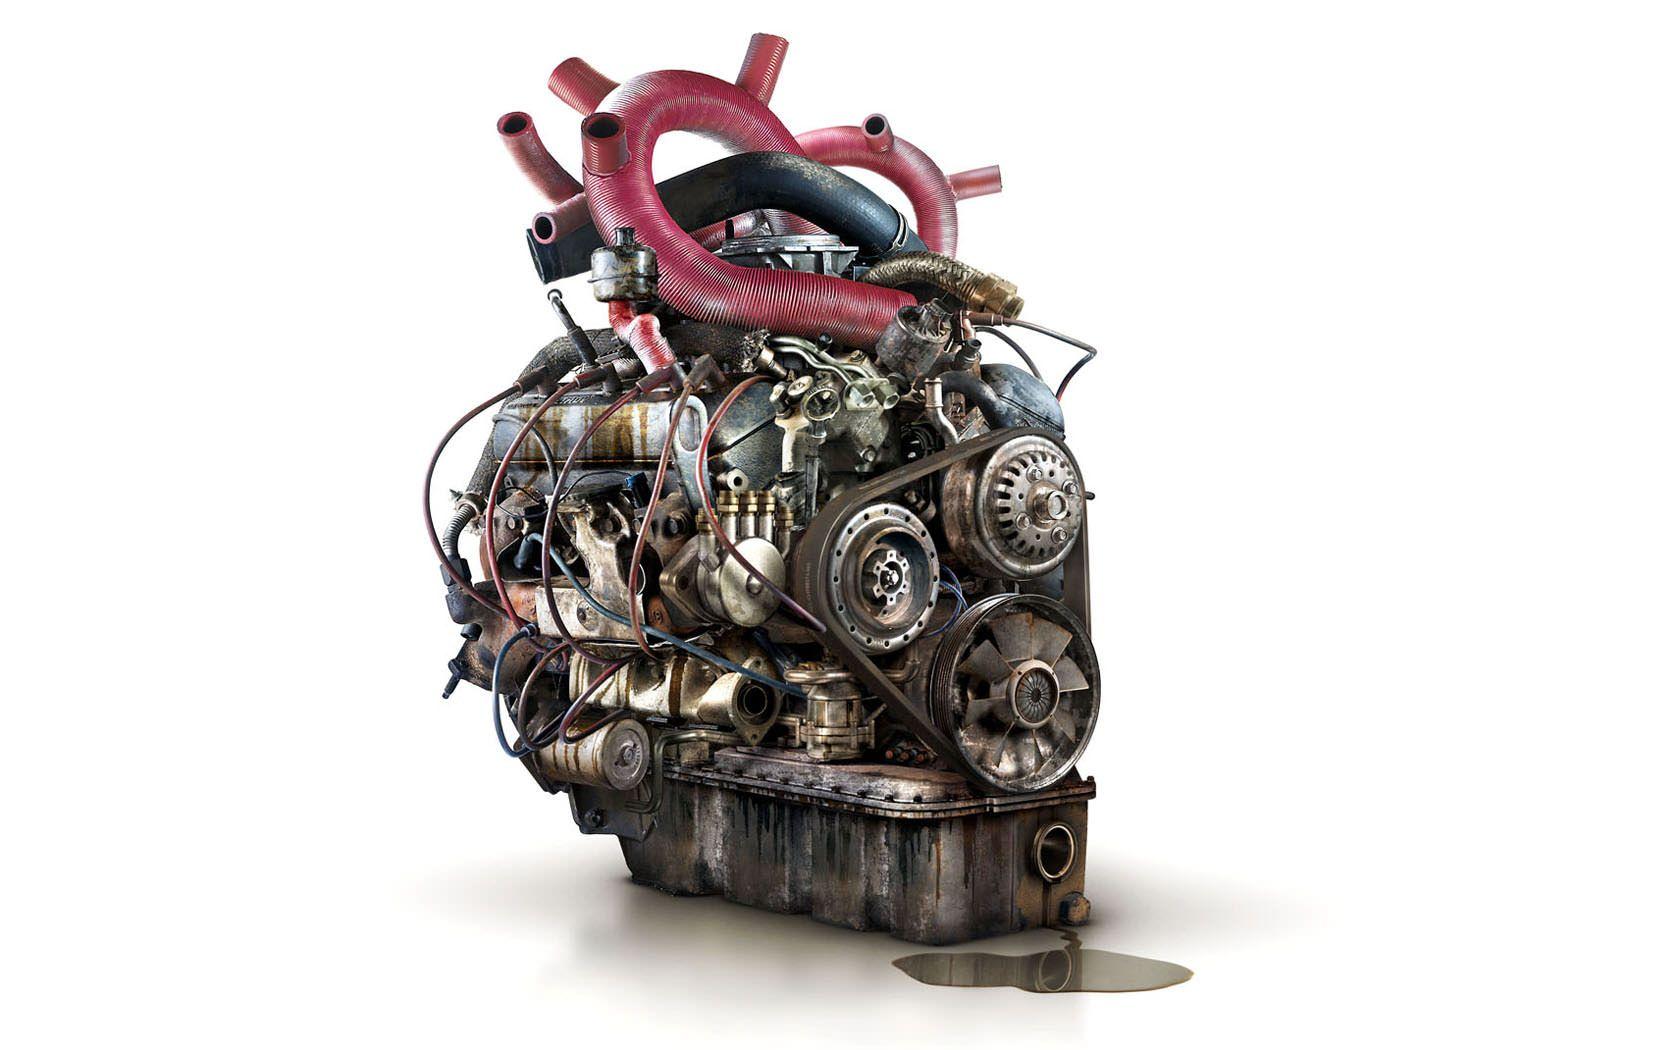 Heart Engine Wallpaper Heart Wallpaper Mechanic Engineering